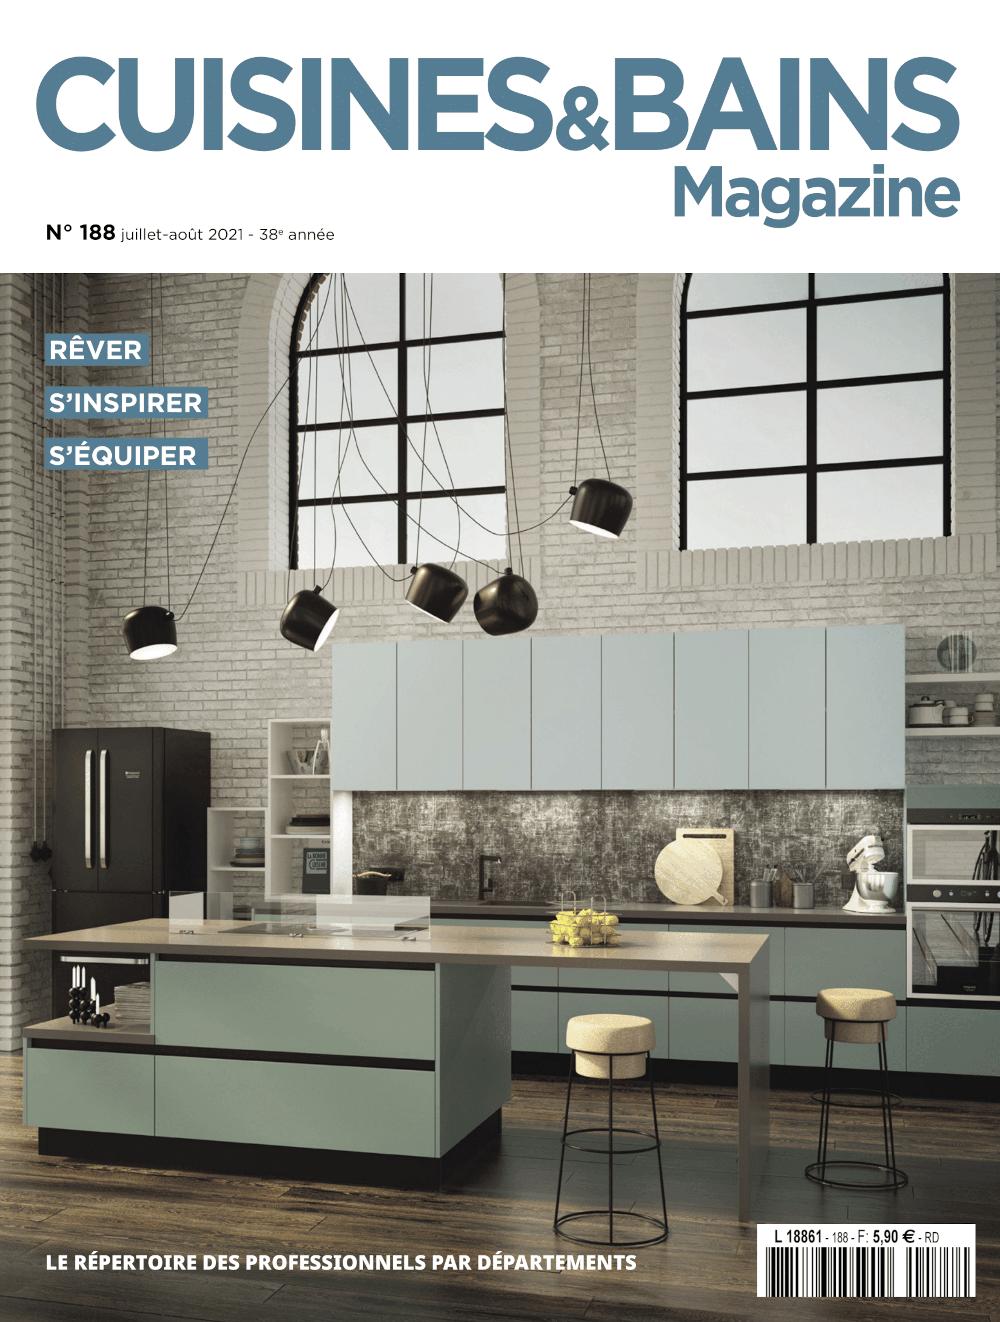 couv-cuisnes-bains-magazine